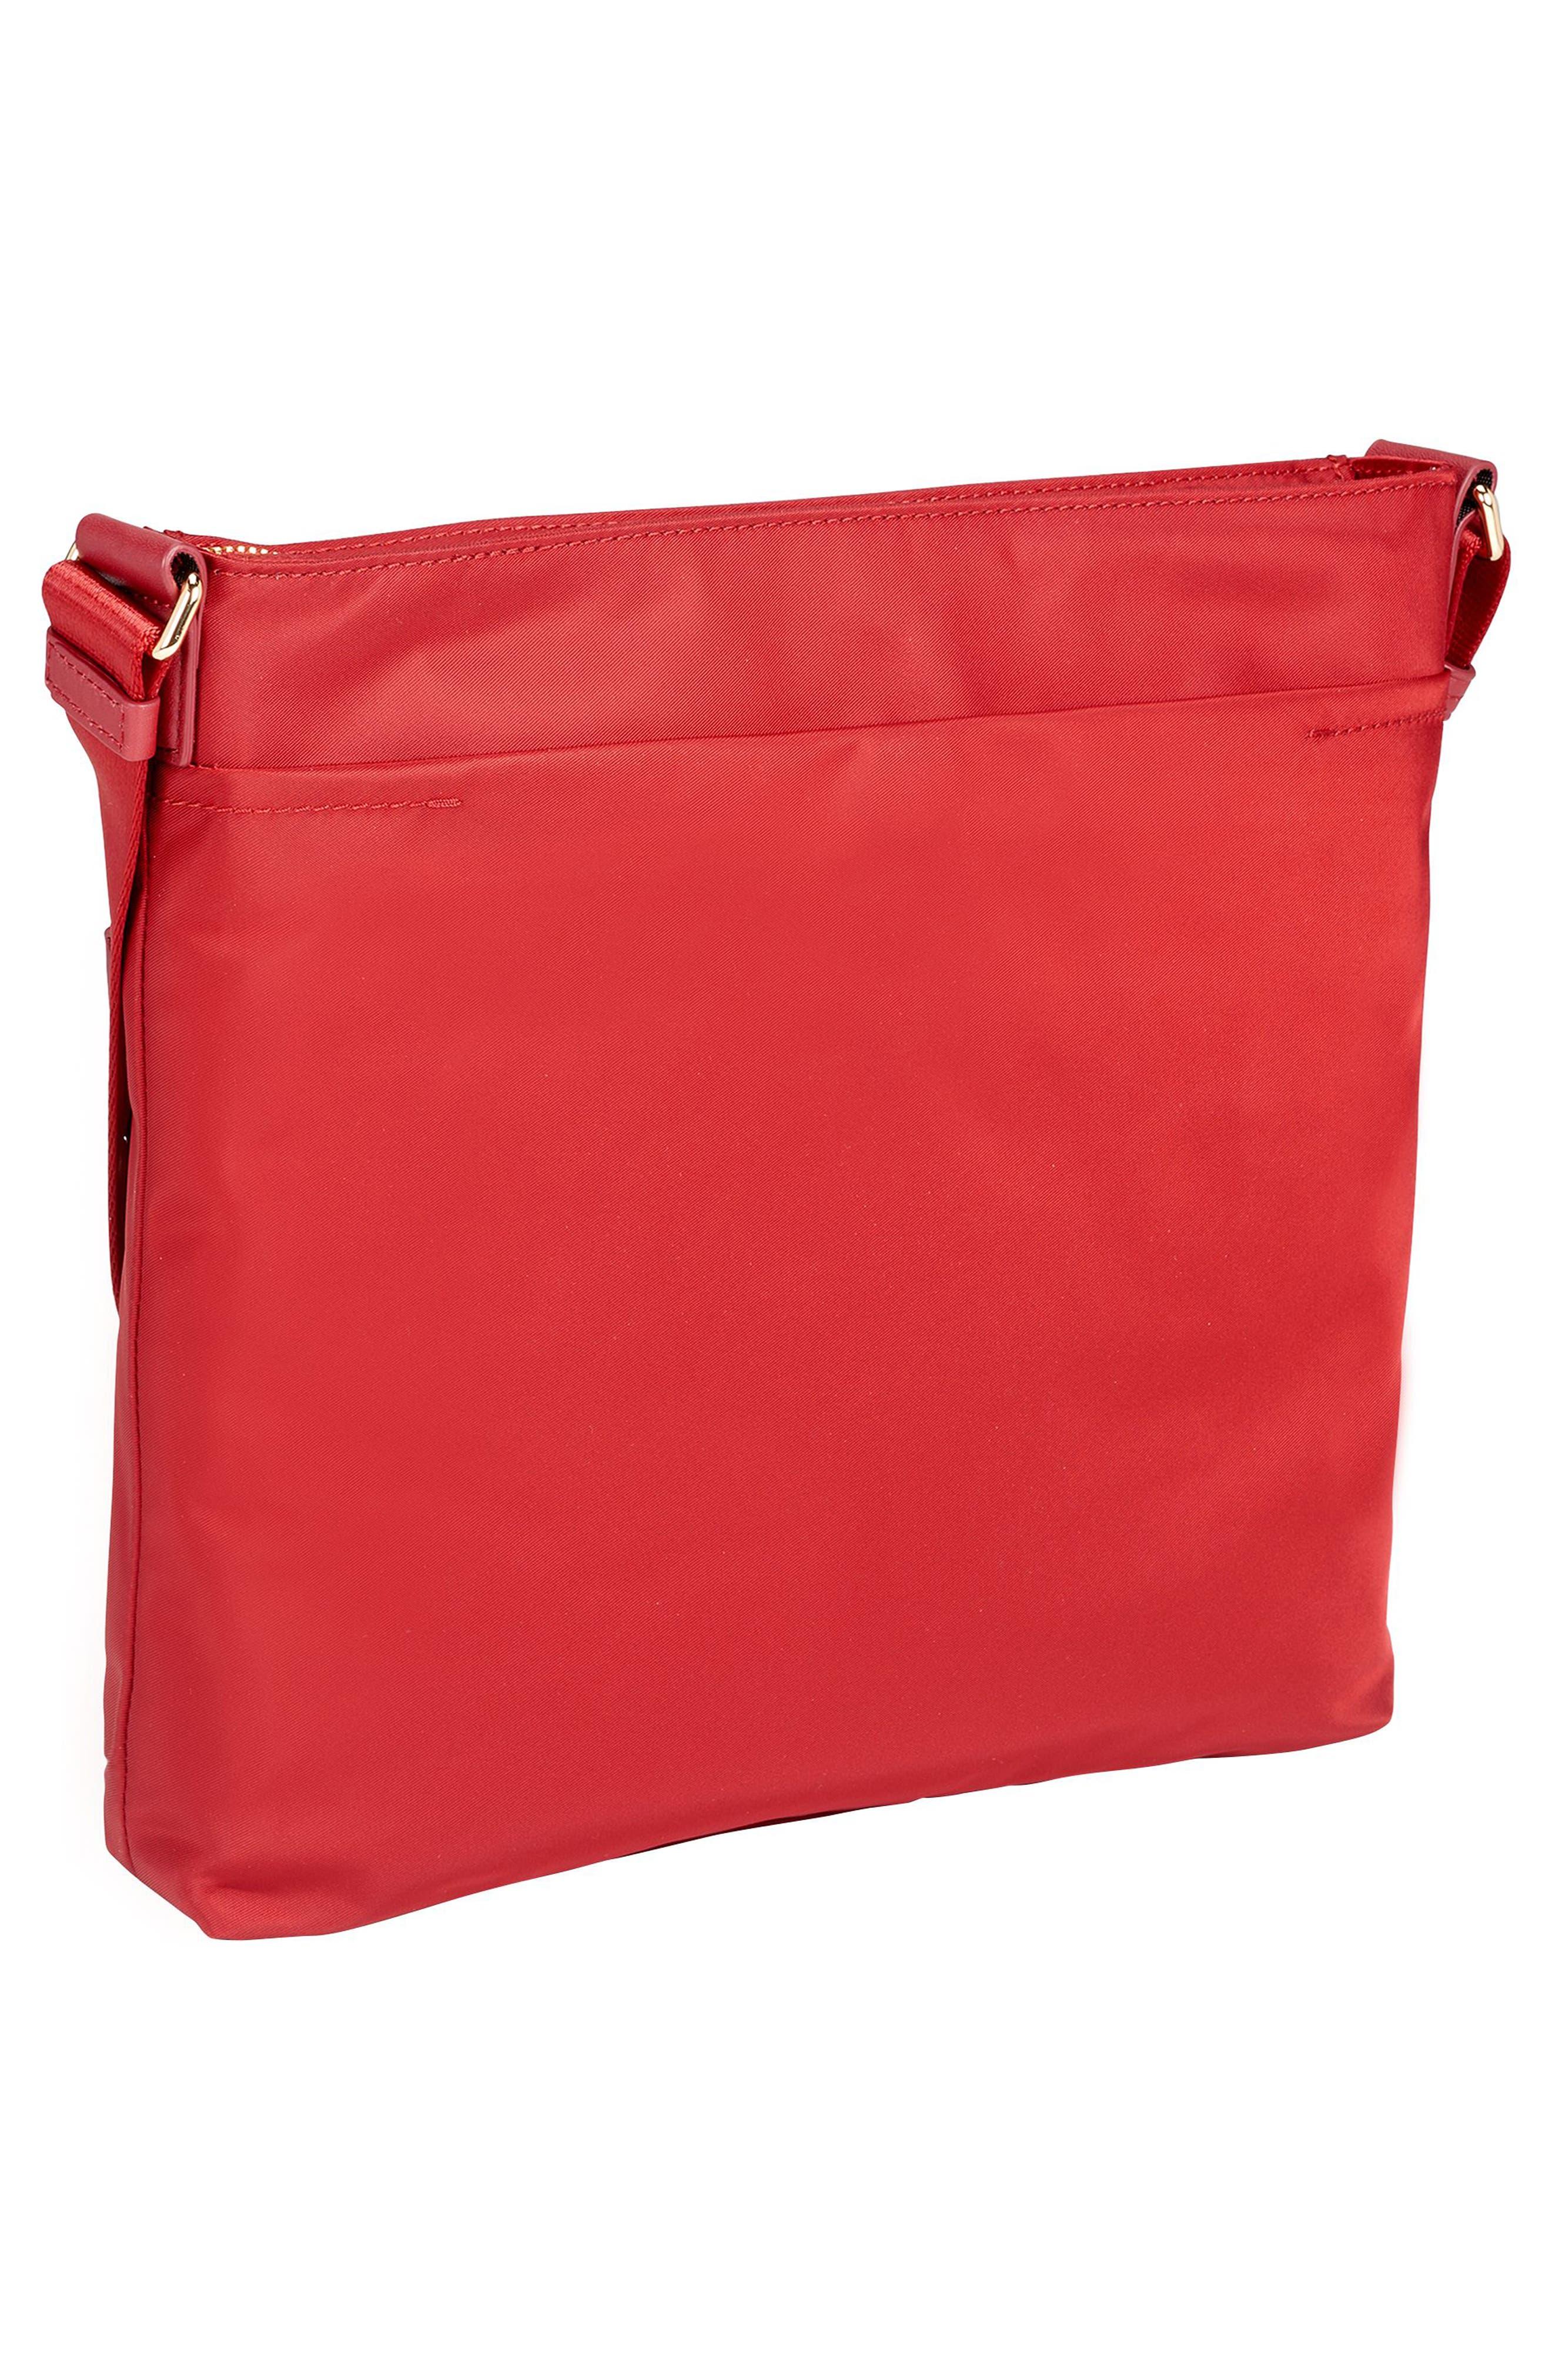 Voyageur - Capri Nylon Crossbody Bag,                             Alternate thumbnail 45, color,